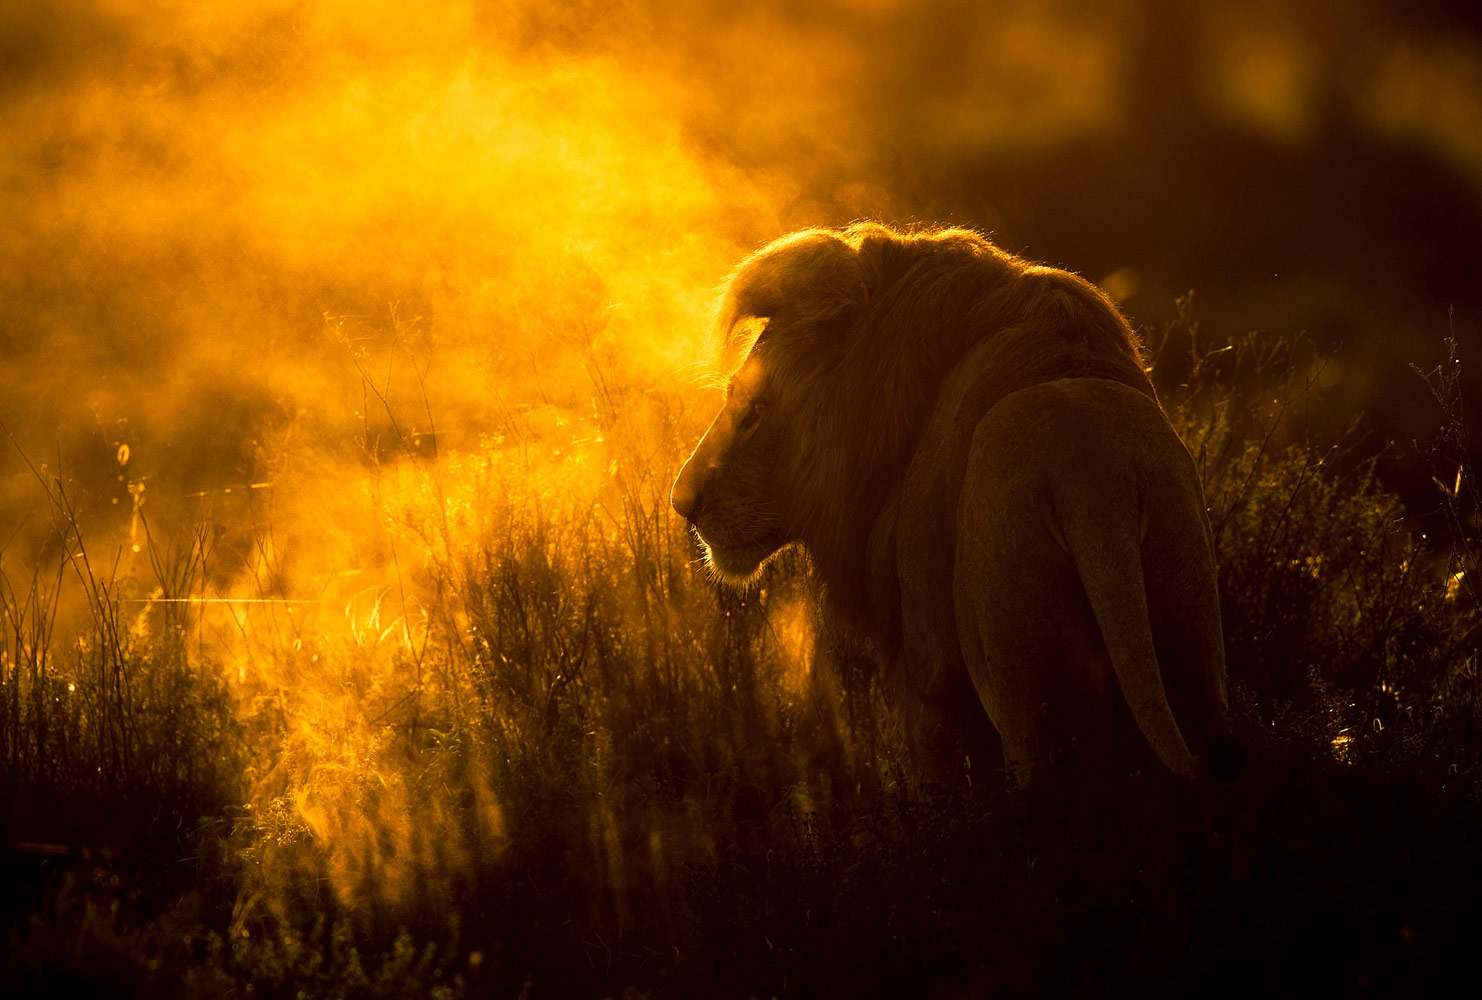 The Lion in the Fog, © Victoras Dubinskas, Winner, Golden Turtle Photo Contest